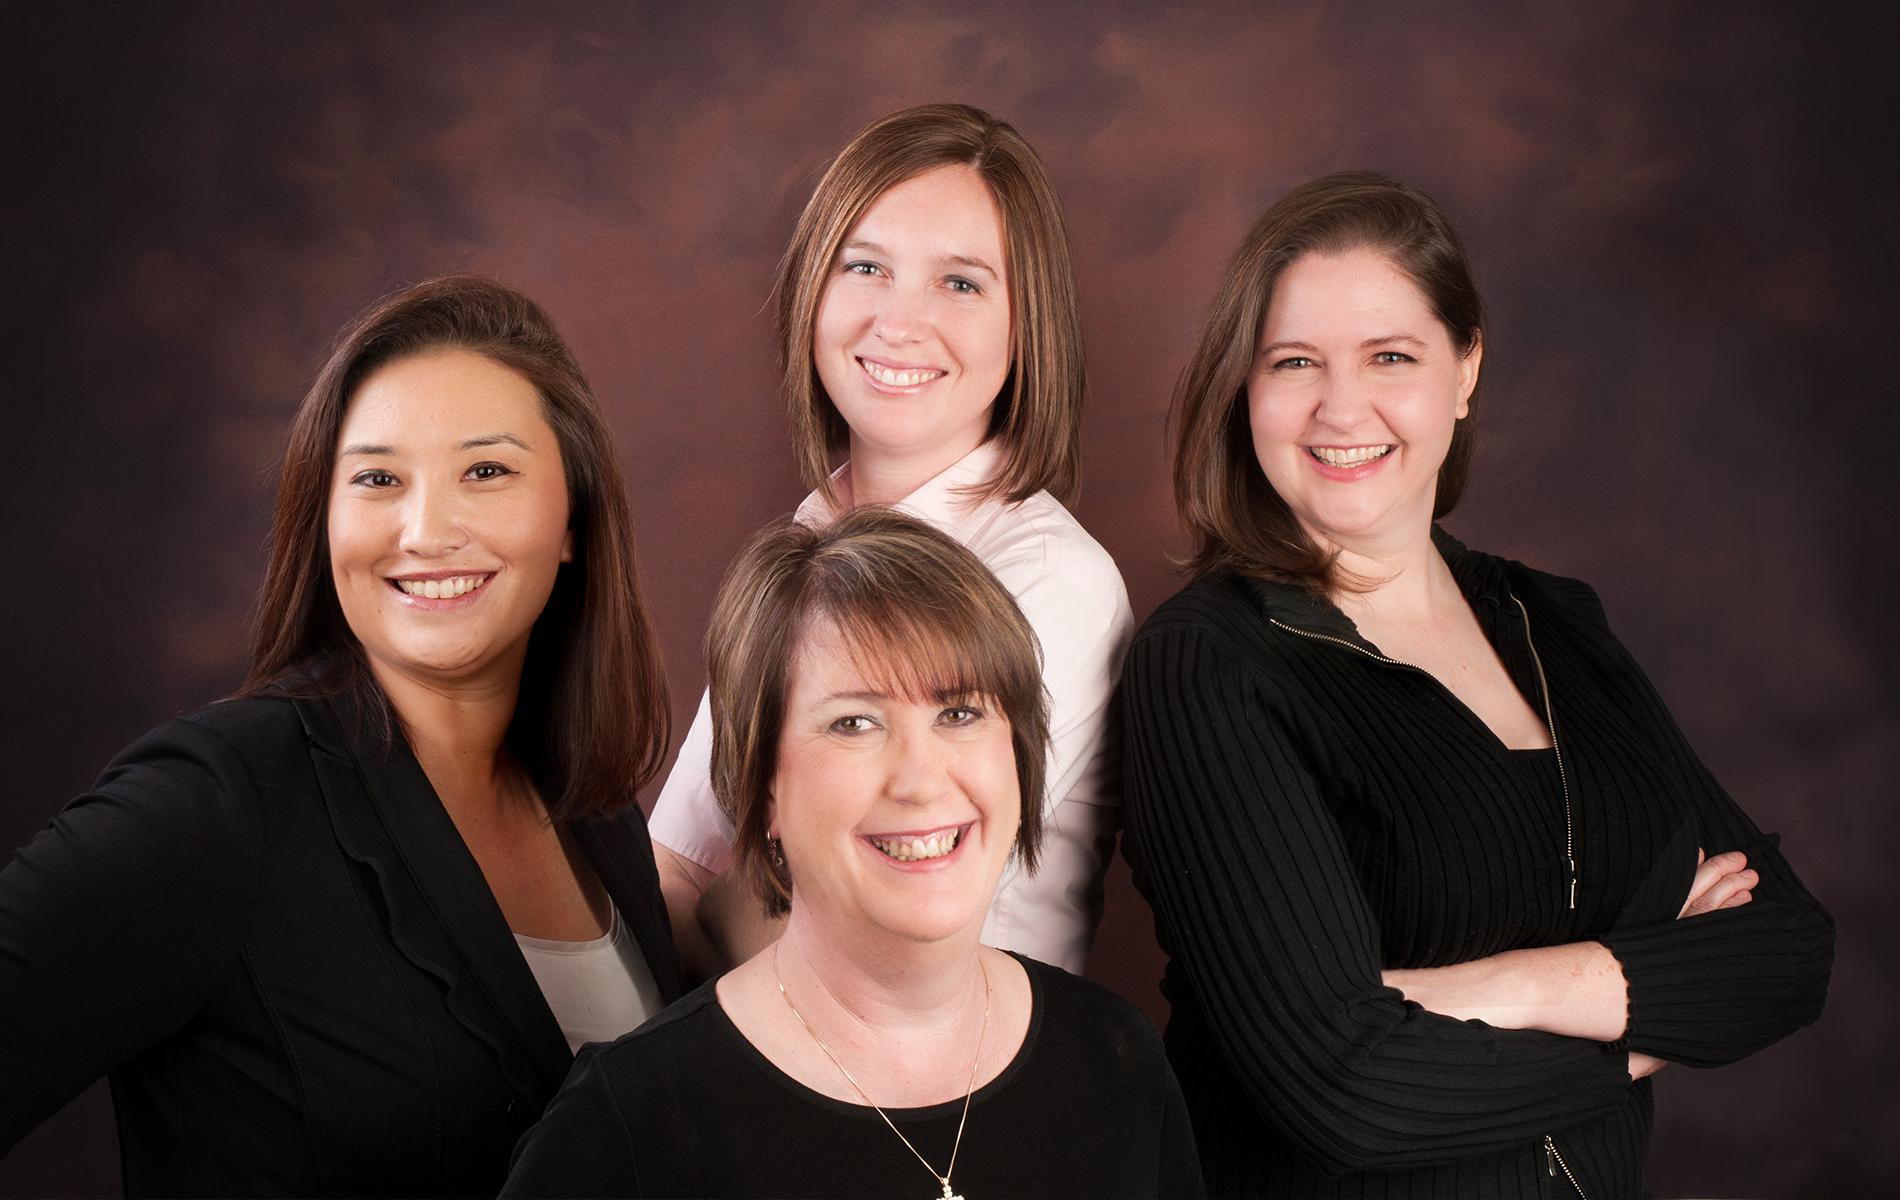 Dallas Business Office Group Portrai